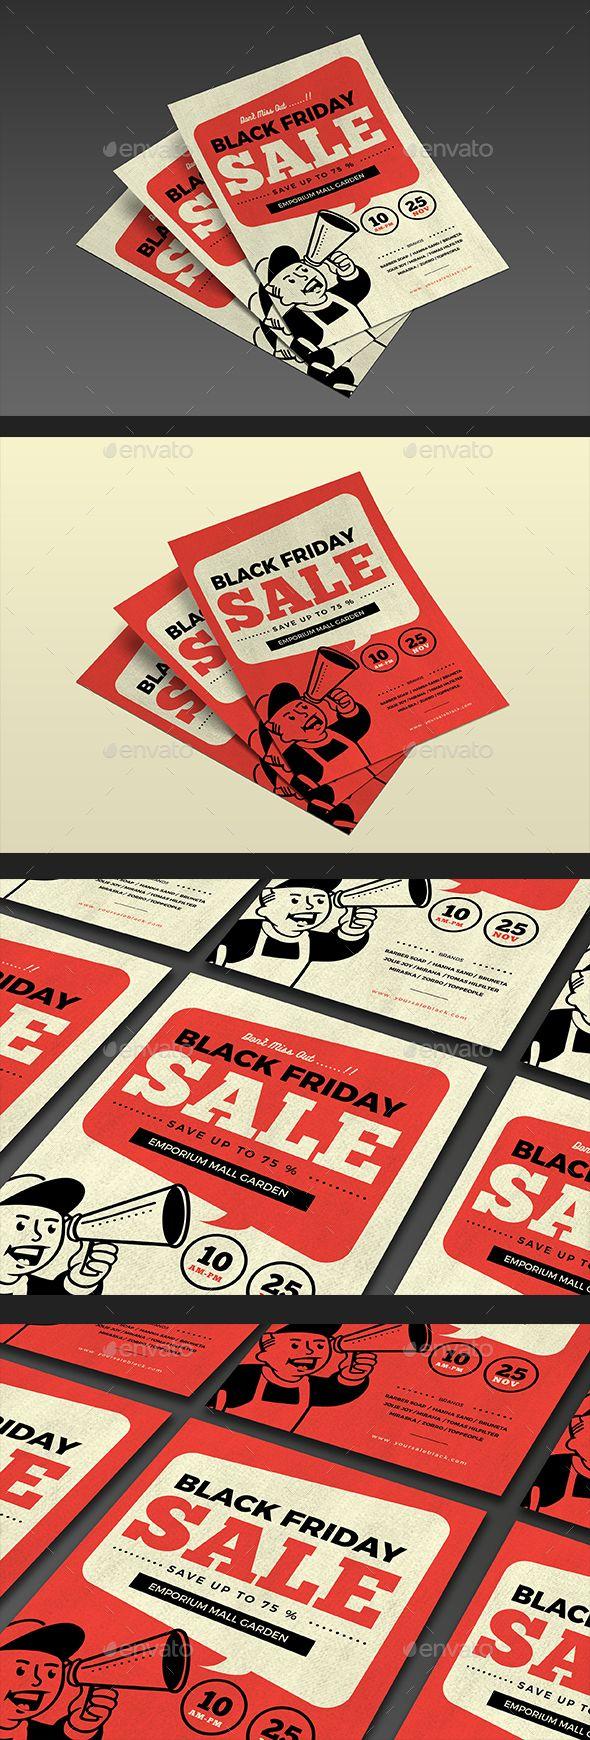 Black Friday Sale Flyer Template PSD, AI Illustrator